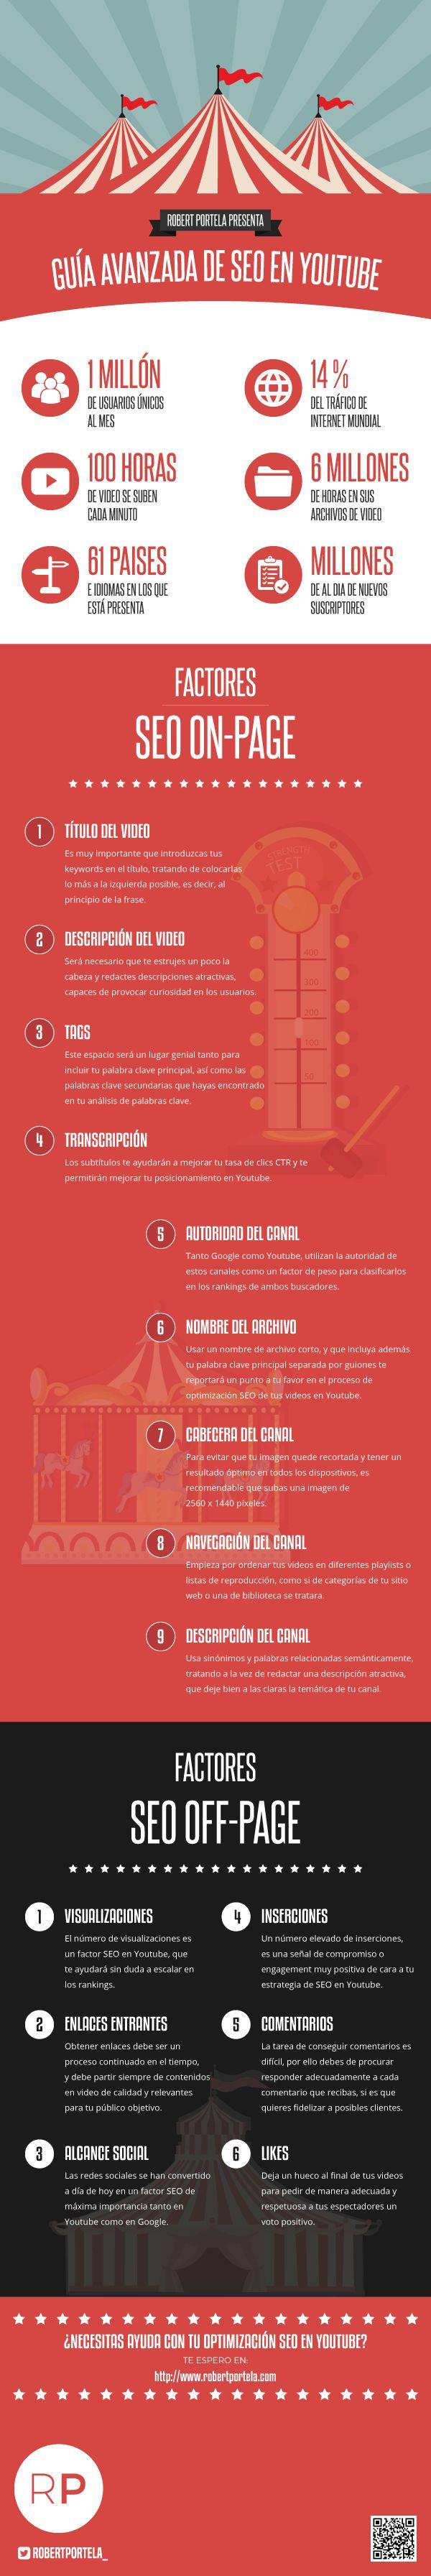 Guía avanzada de SEO en Youtube #socialmedia via @jugosocial http://www.jugosocial.com/guia-avanzada-de-seo-en-youtube/